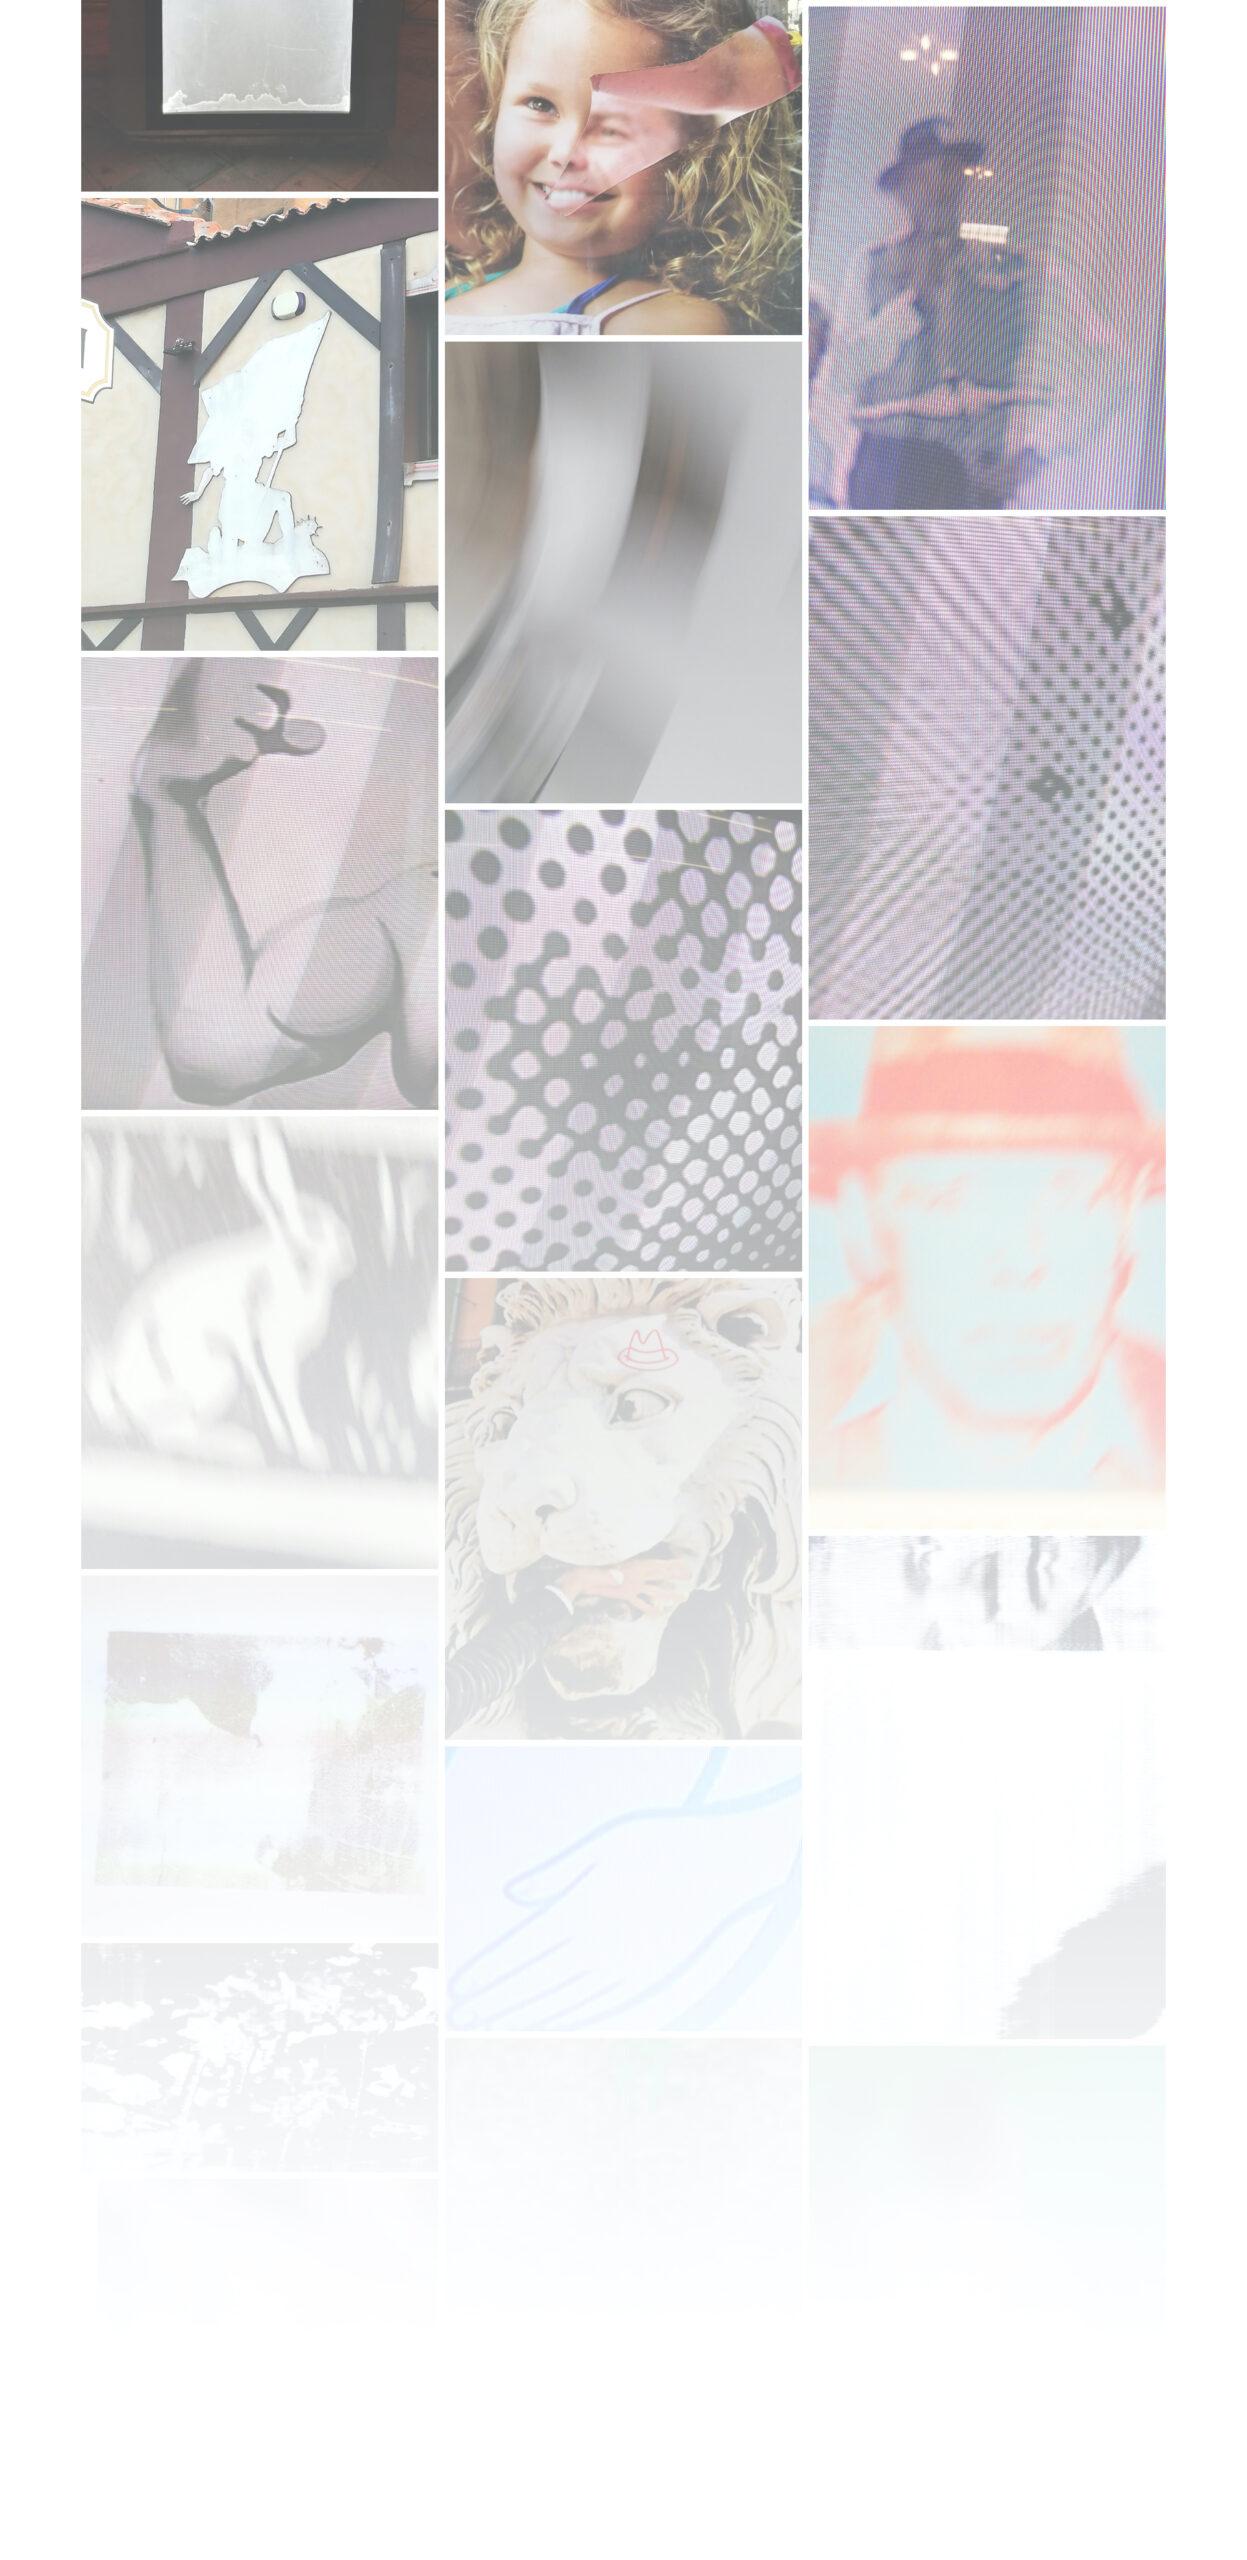 2021_Cristina santos Virtual_Captura_web